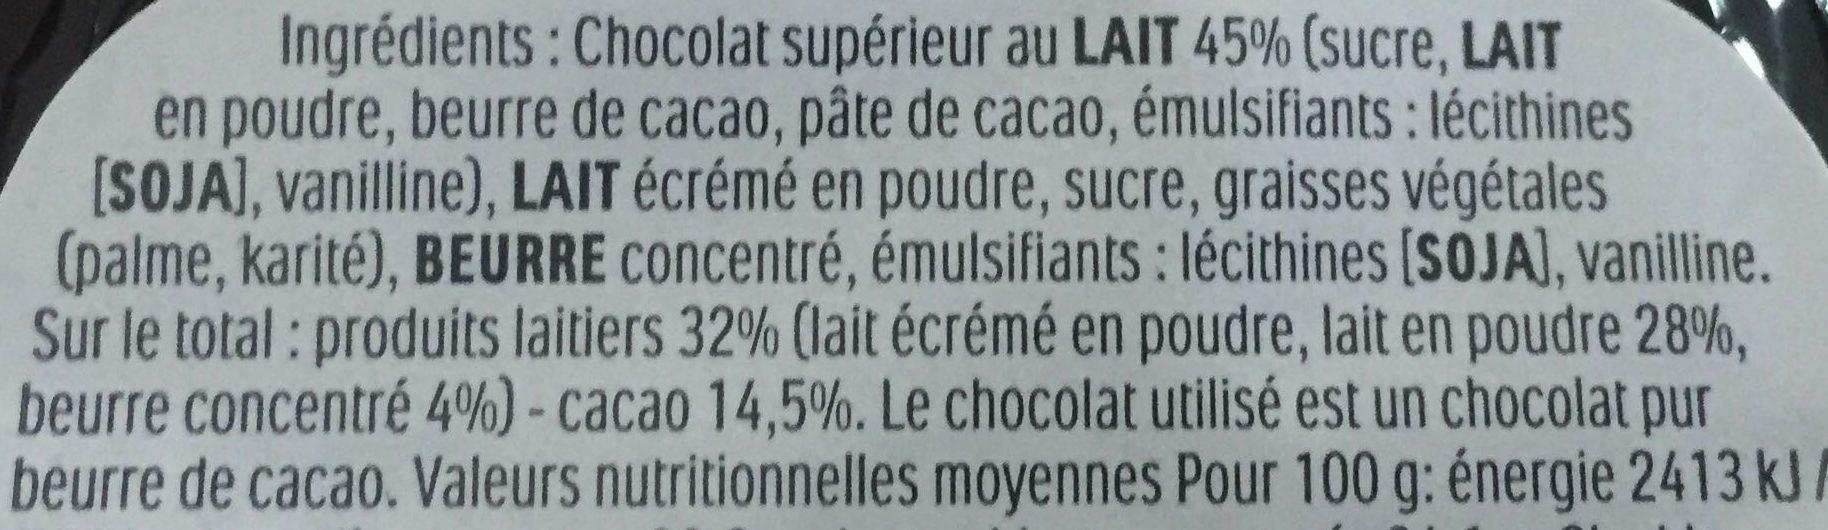 Kinder moulage - Ingredienti - fr